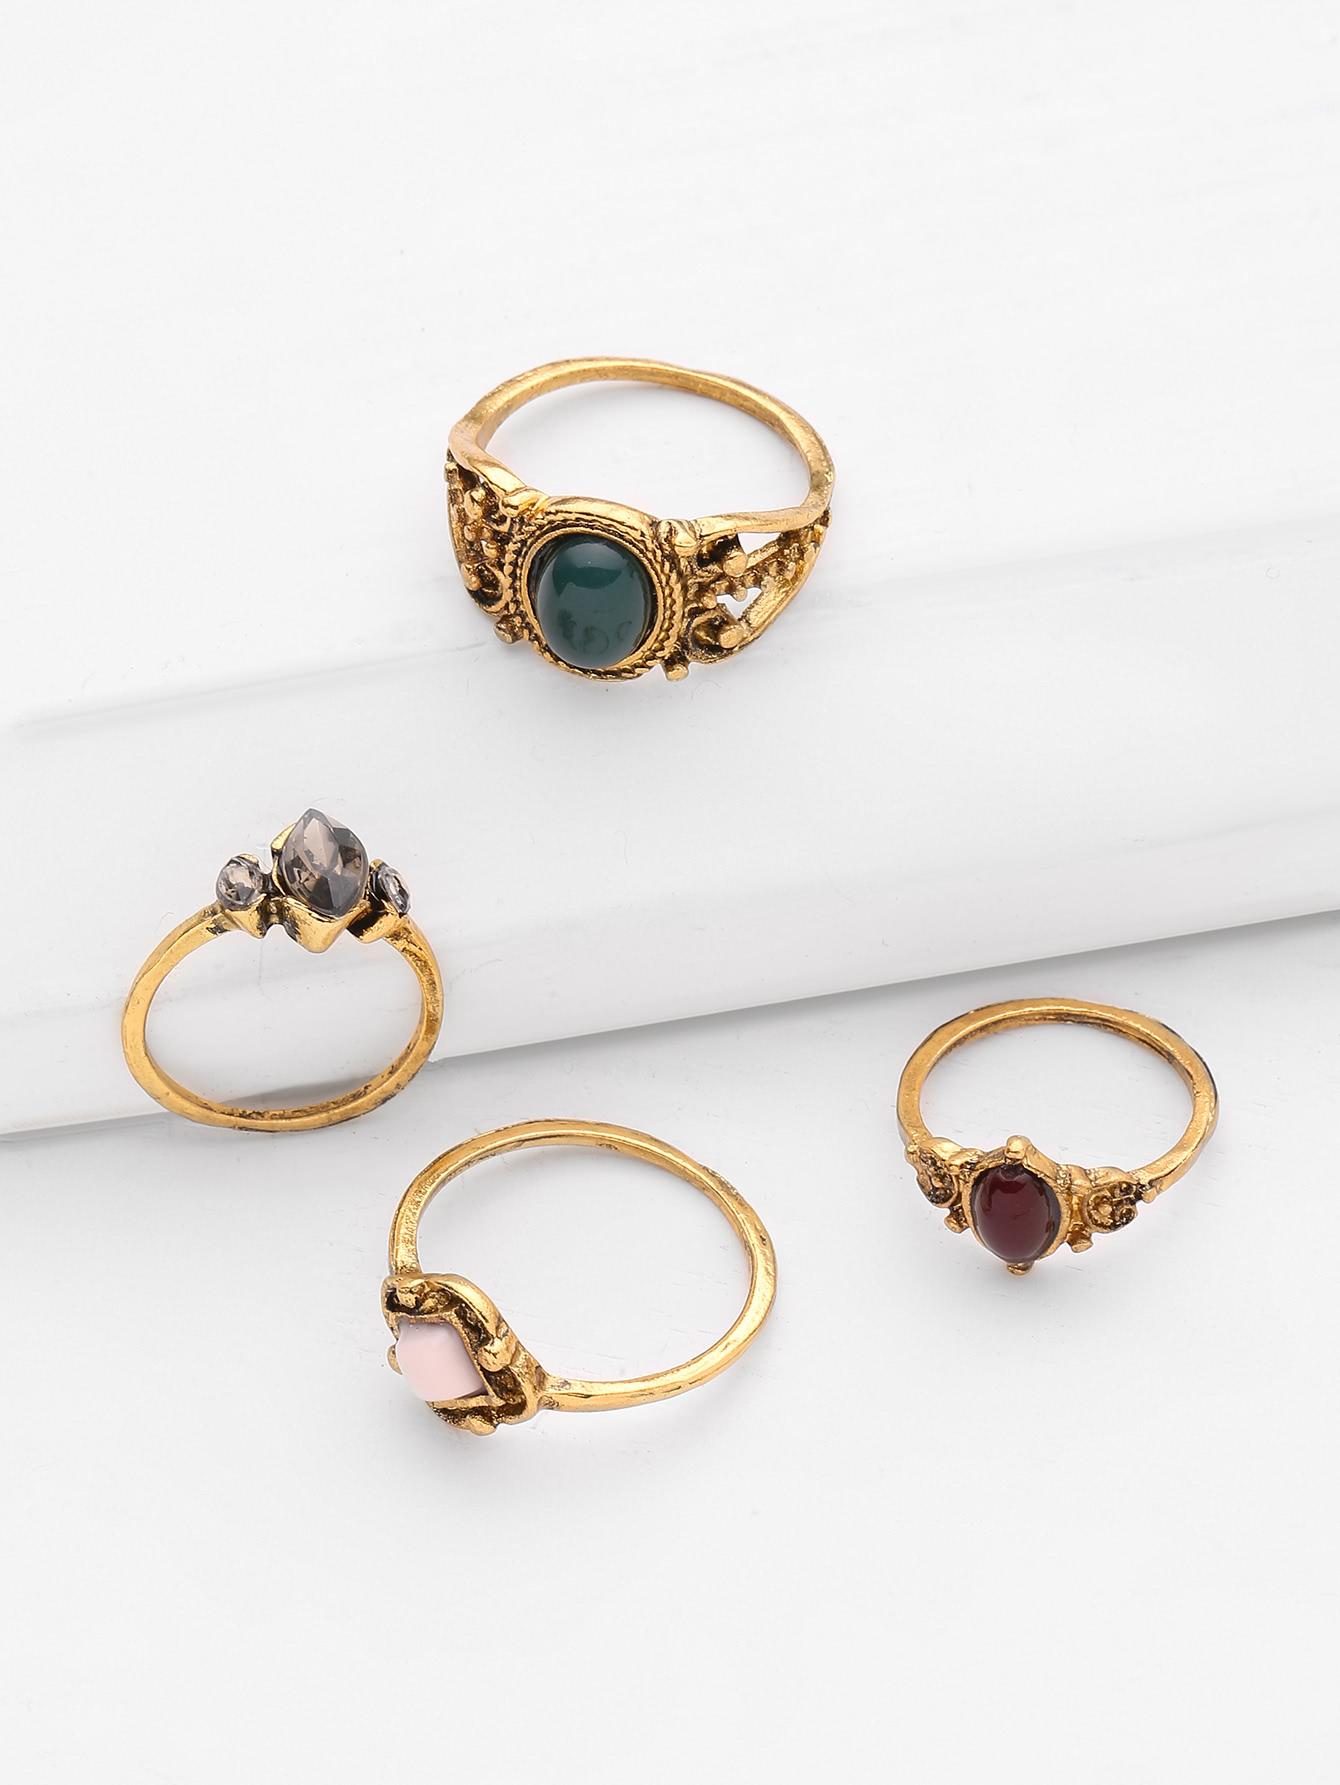 Gemstone Design Retro Ring Set 4pcs